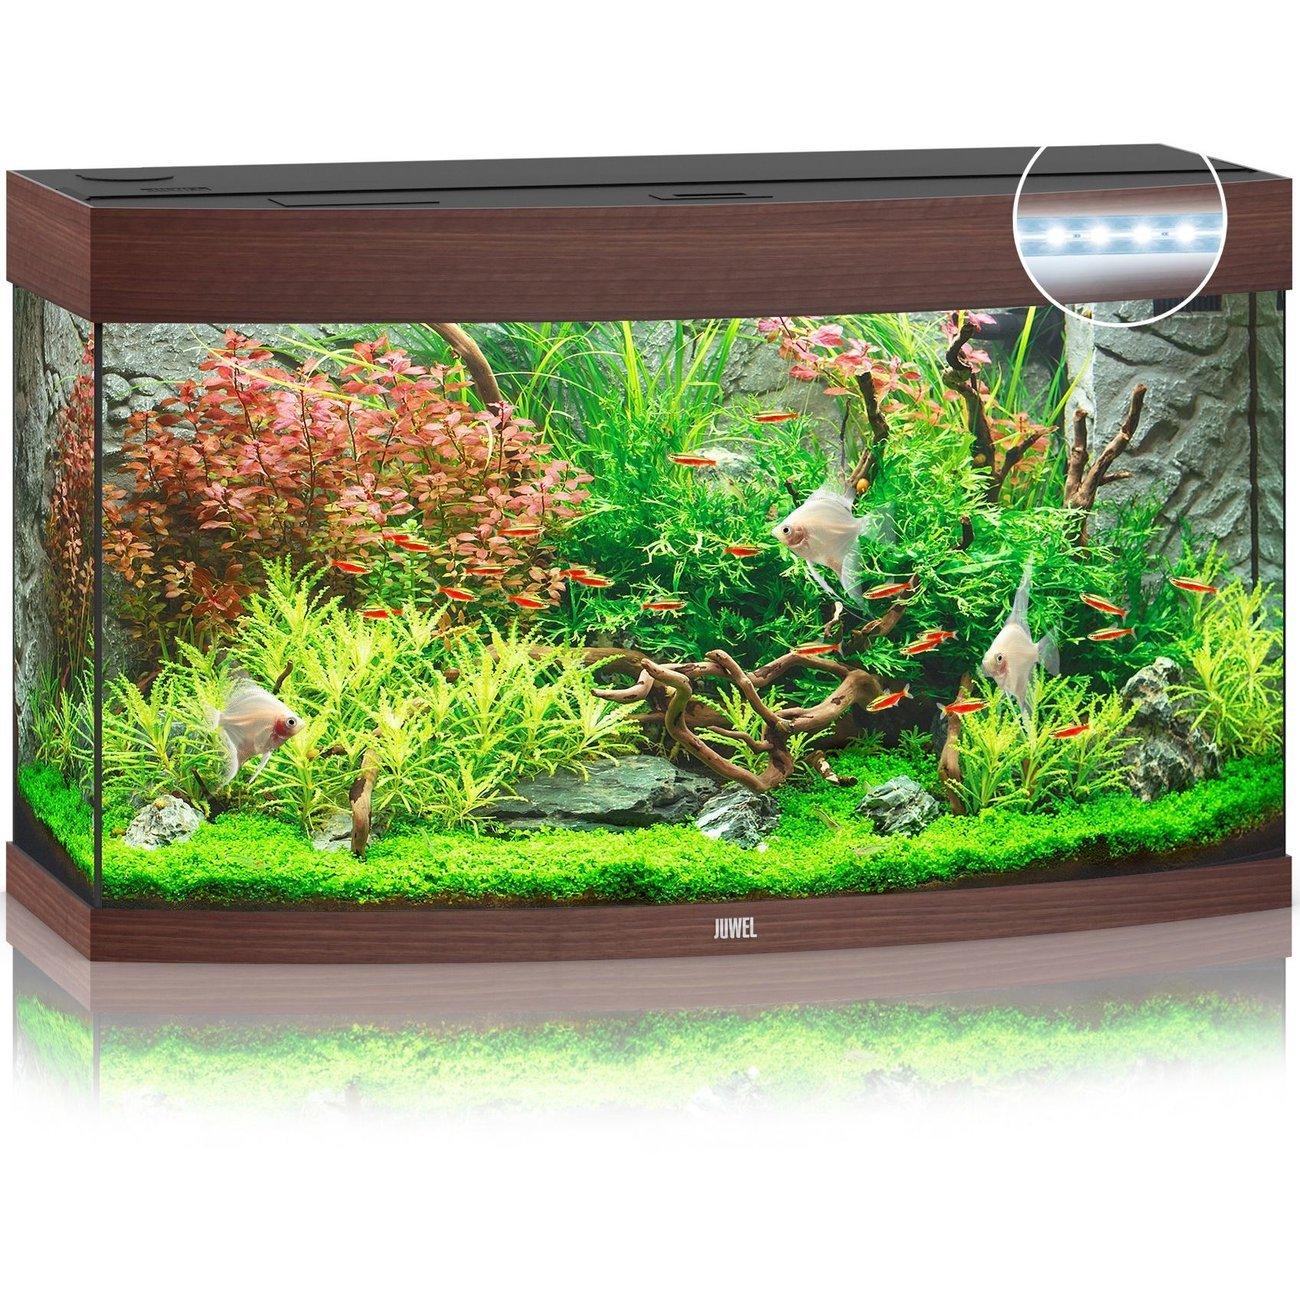 Juwel Vision 180 LED Aquarium, Bild 2